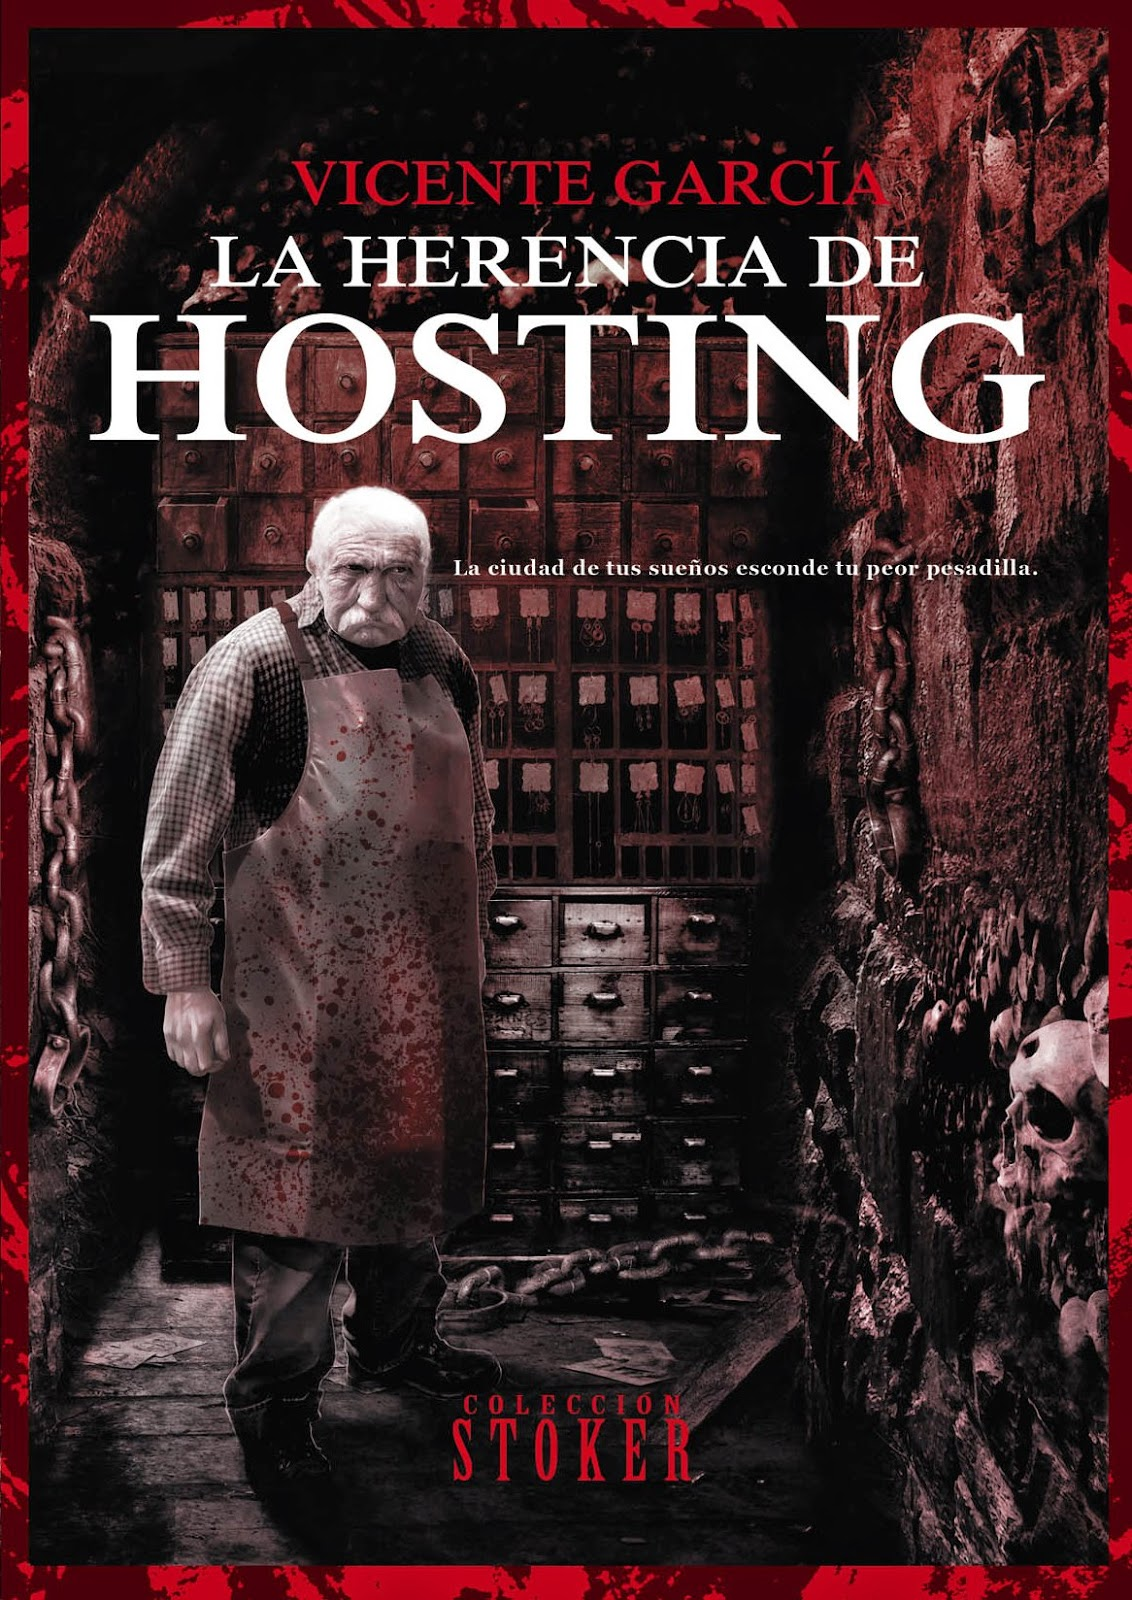 http://www.dolmeneditorial.com/proxima-novedad-stoker-la-herencia-de-hosting/